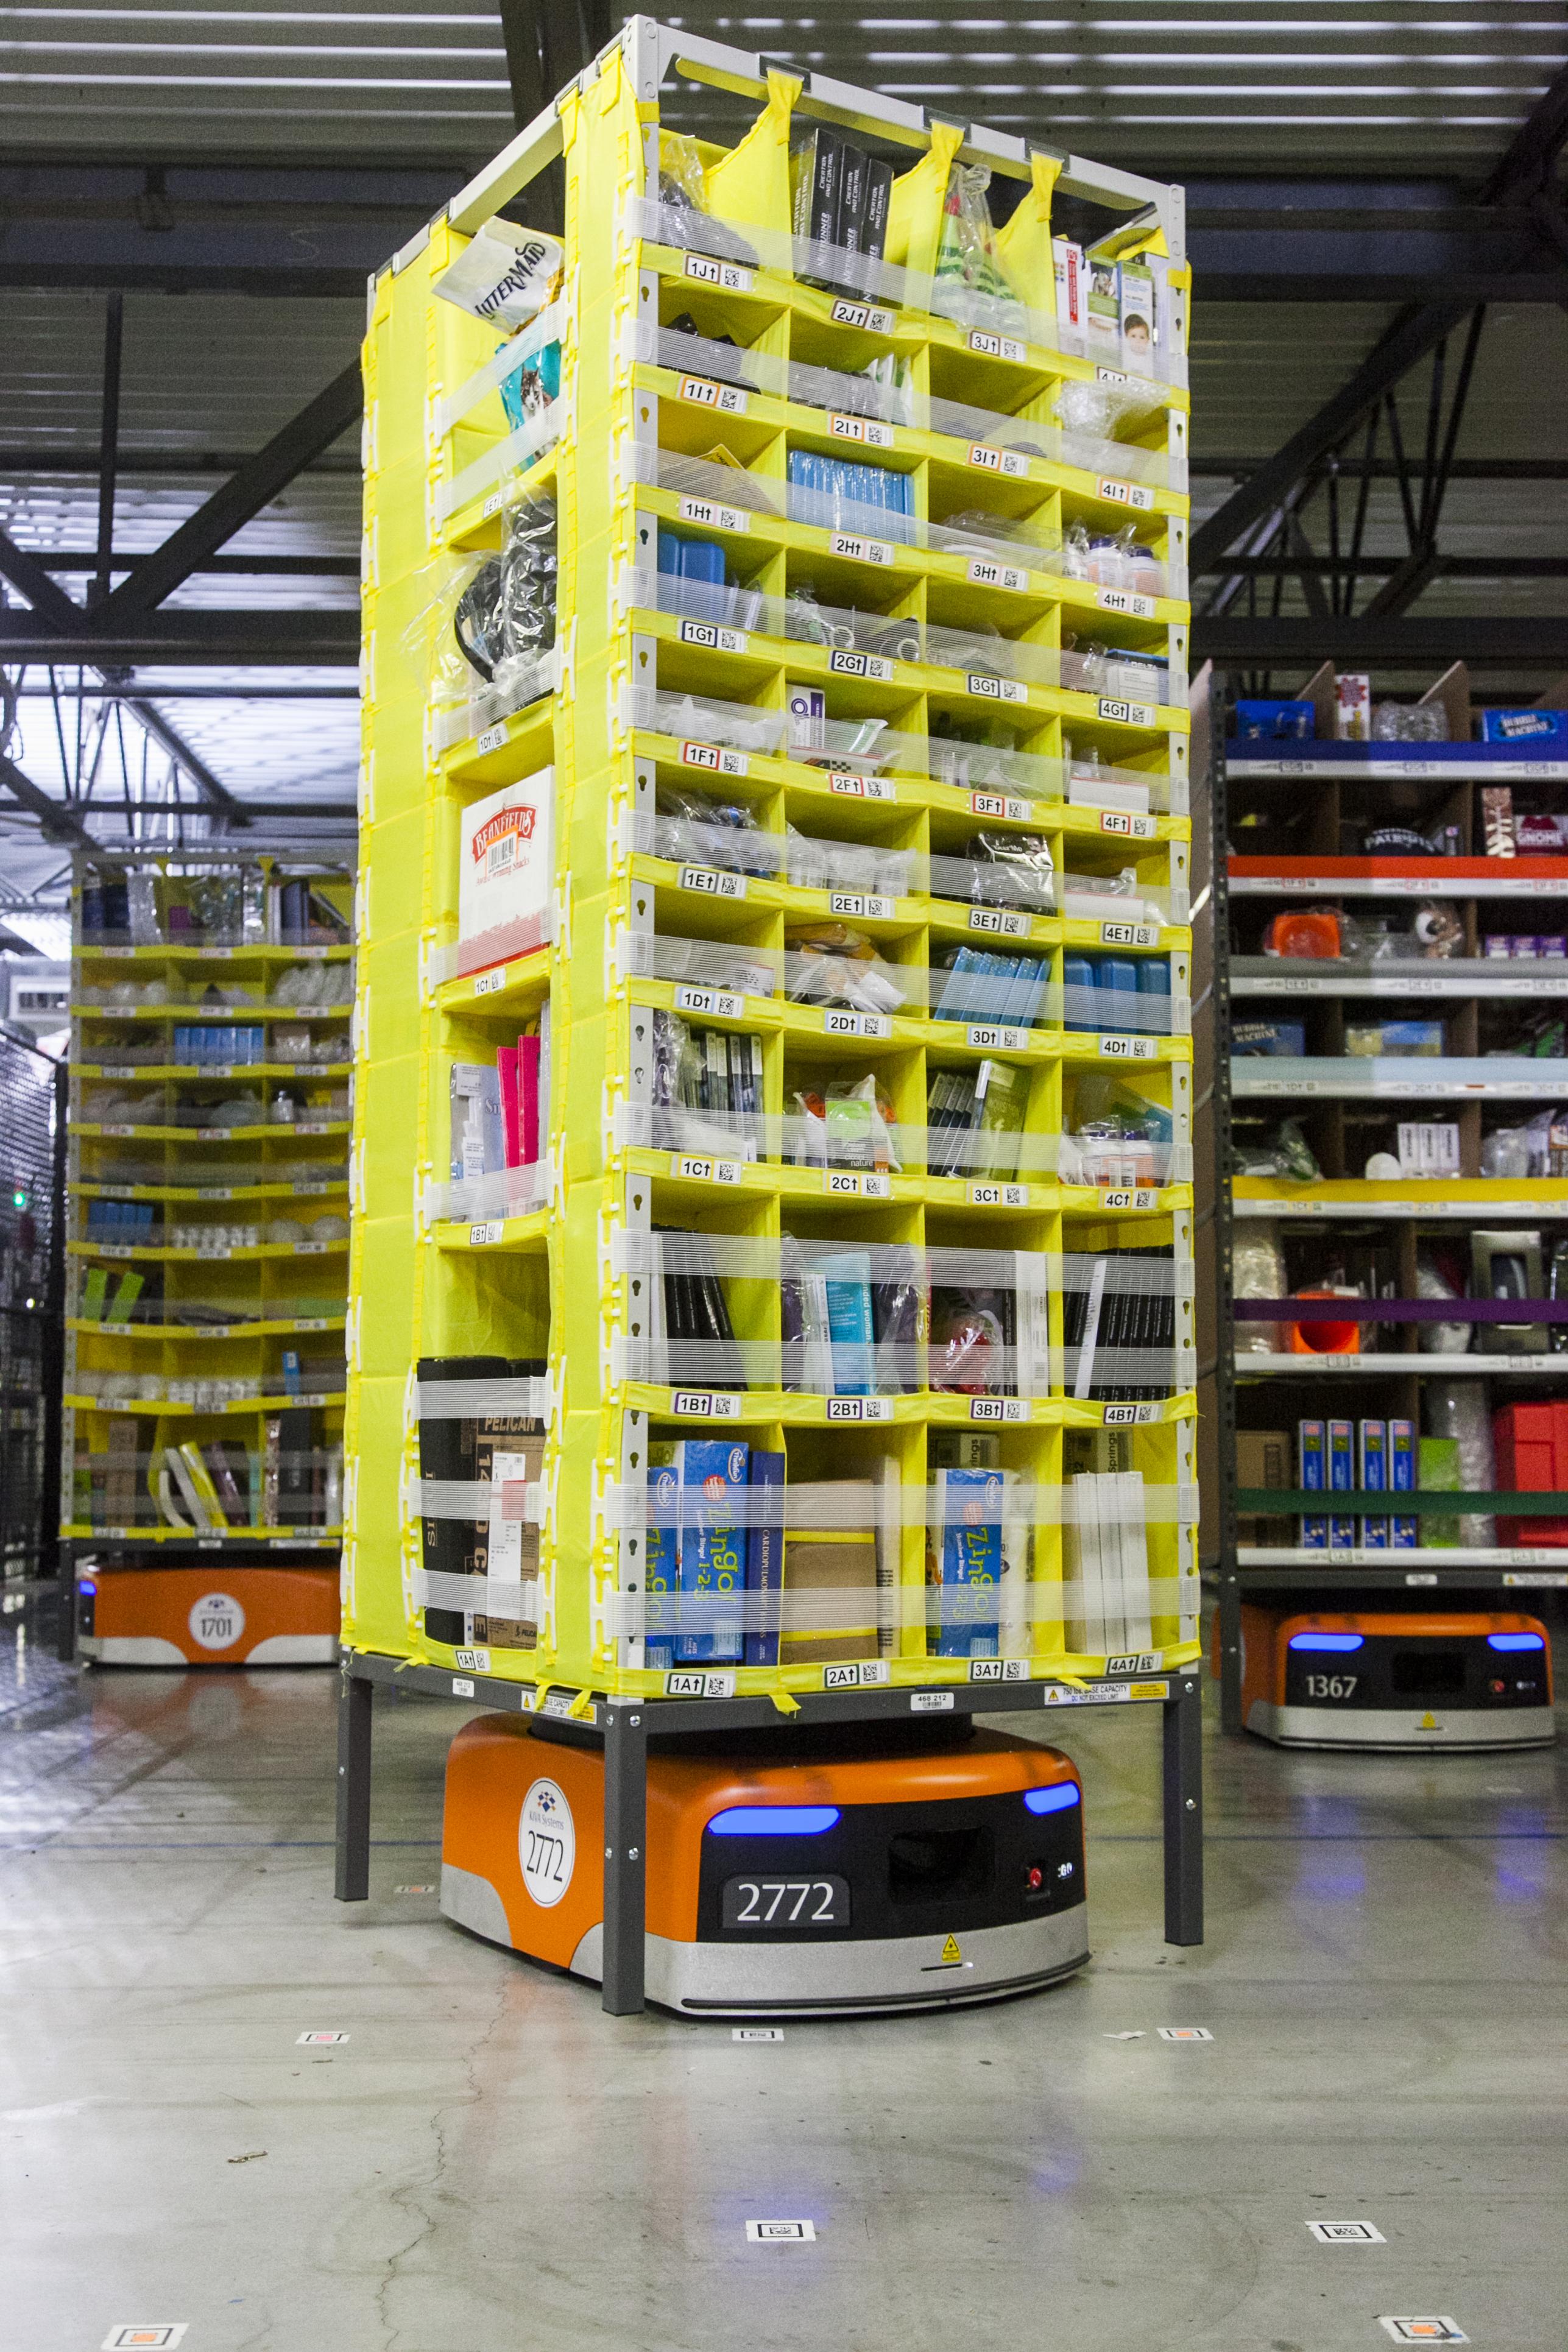 Kiva robot in an Amazon Fulfillment Center